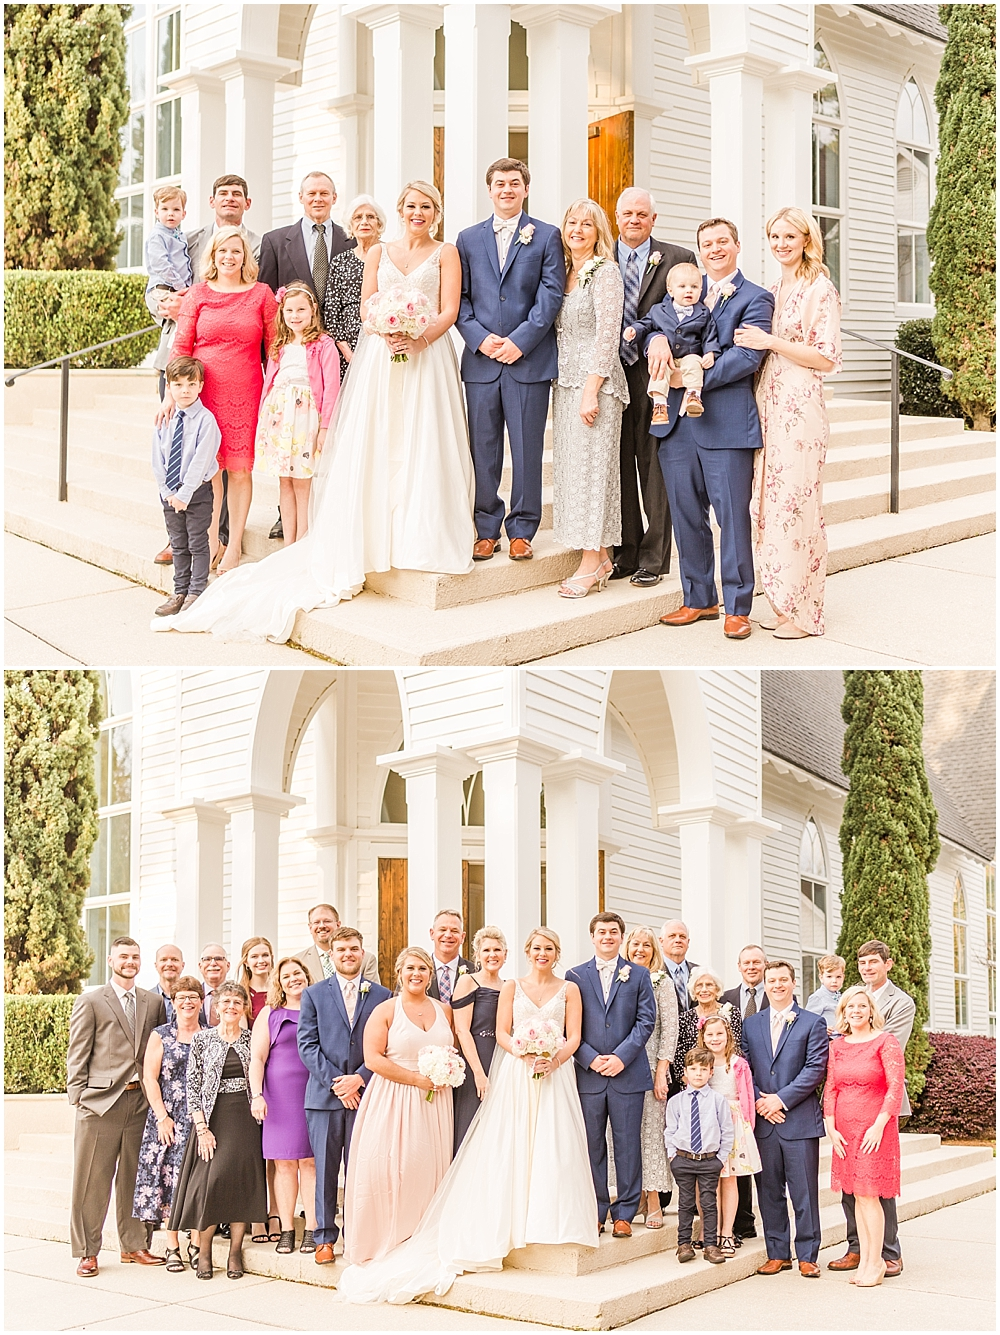 Ashton-Clark-Photography-Wedding-Portrait-Family-Photographer-Mobile-Alabama_0341.jpg